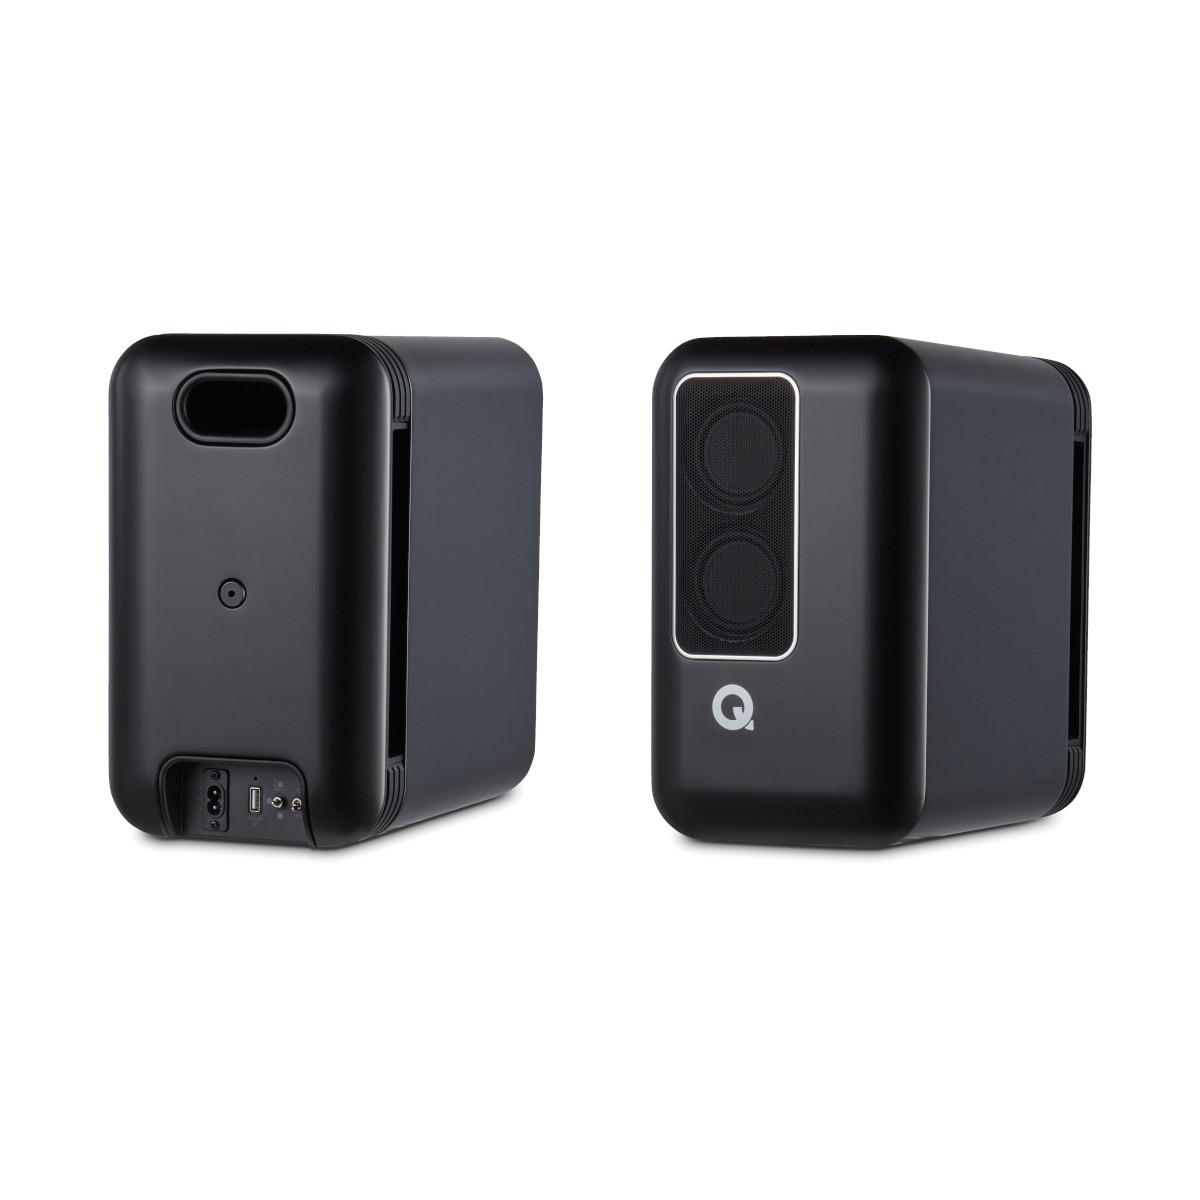 Q-Acoustics Q Active 200 Kompakt-Lautsprecher Paar, incl. Active Steuereinheit, Google Chromecast Version, ohne Ständer